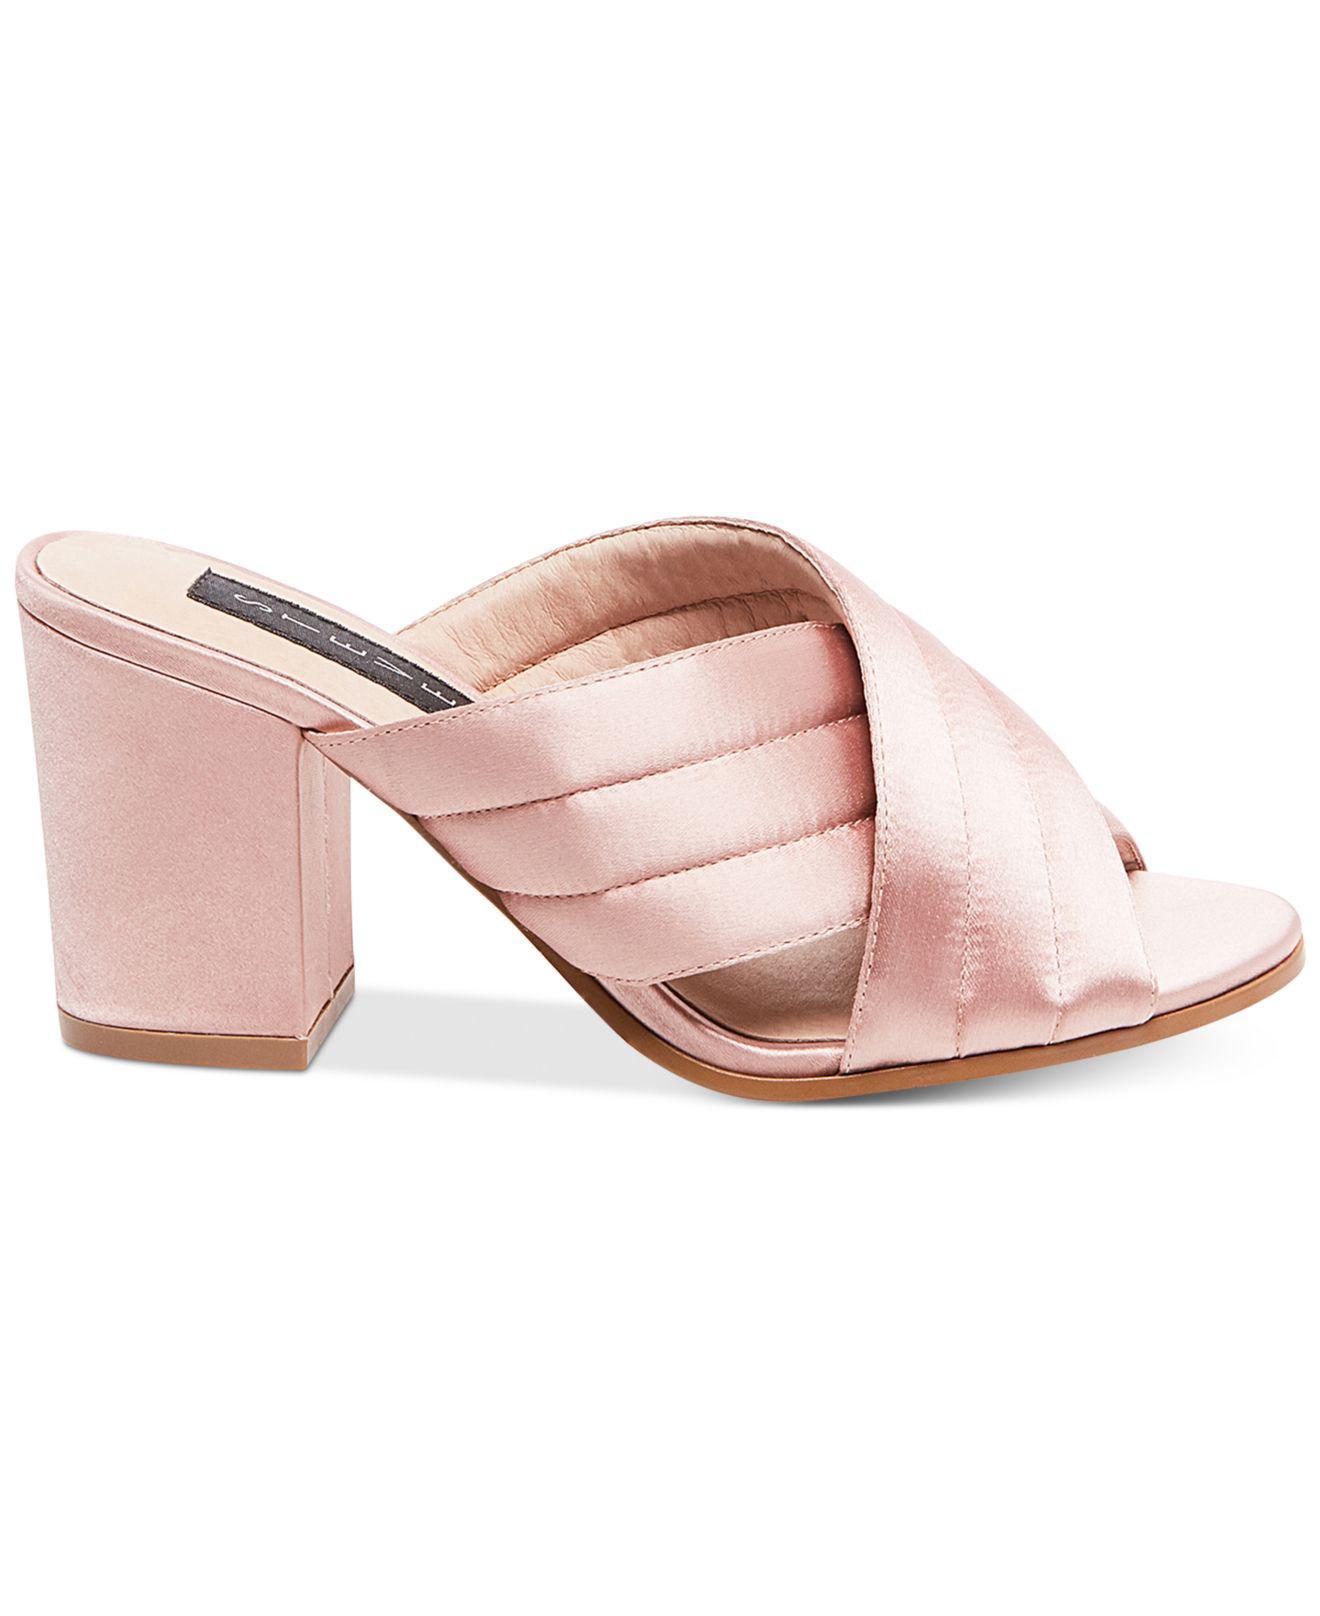 12d11e79829 Lyst - Steven By Steve Madden Women s Zada Slide-on Block-heel ...